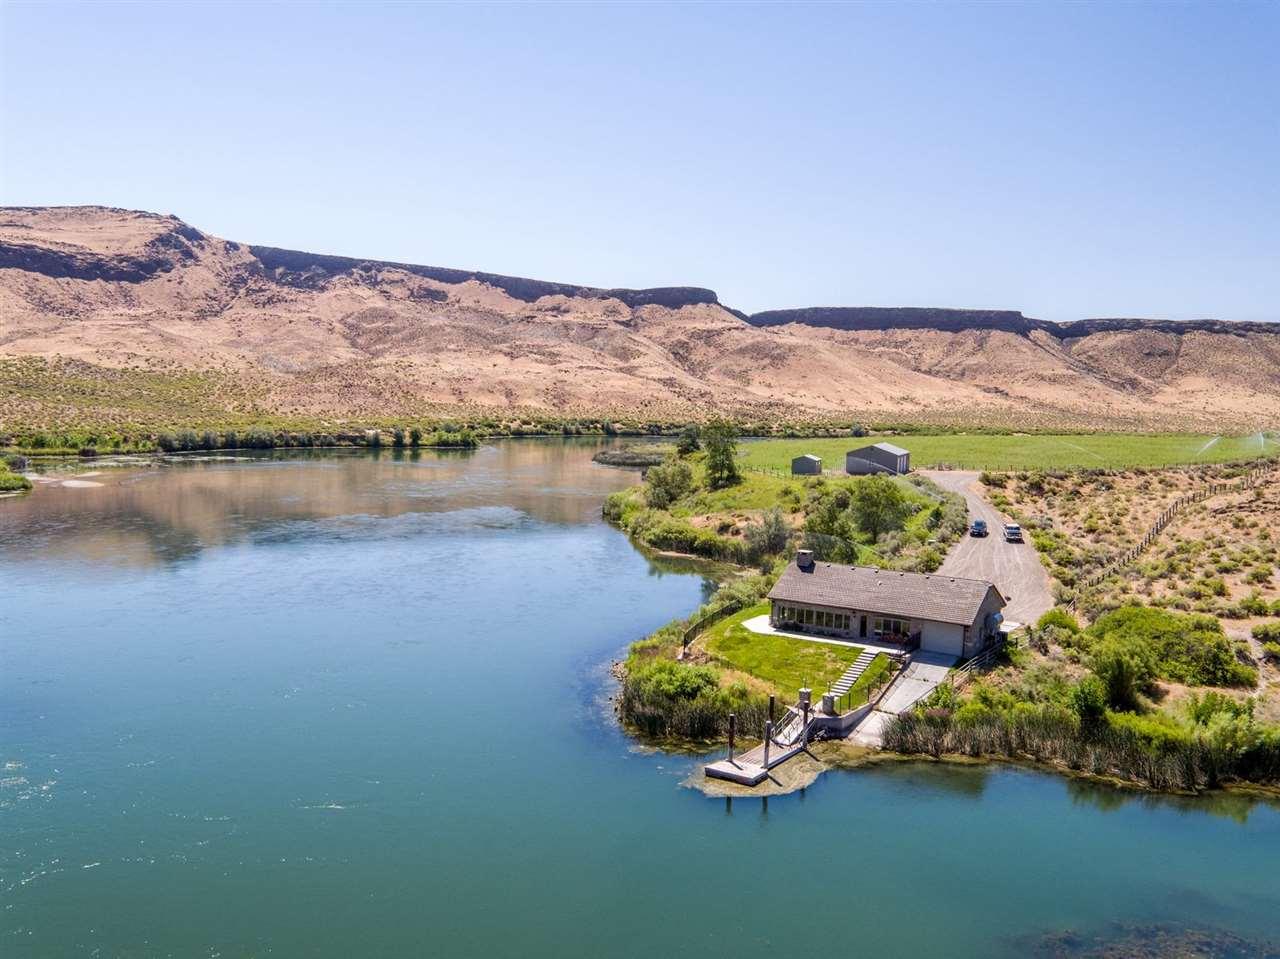 Ферма / ранчо / плантация для того Продажа на Bonus Cove Ranch, Grand View Grand View, Айдахо, 83624 Соединенные Штаты